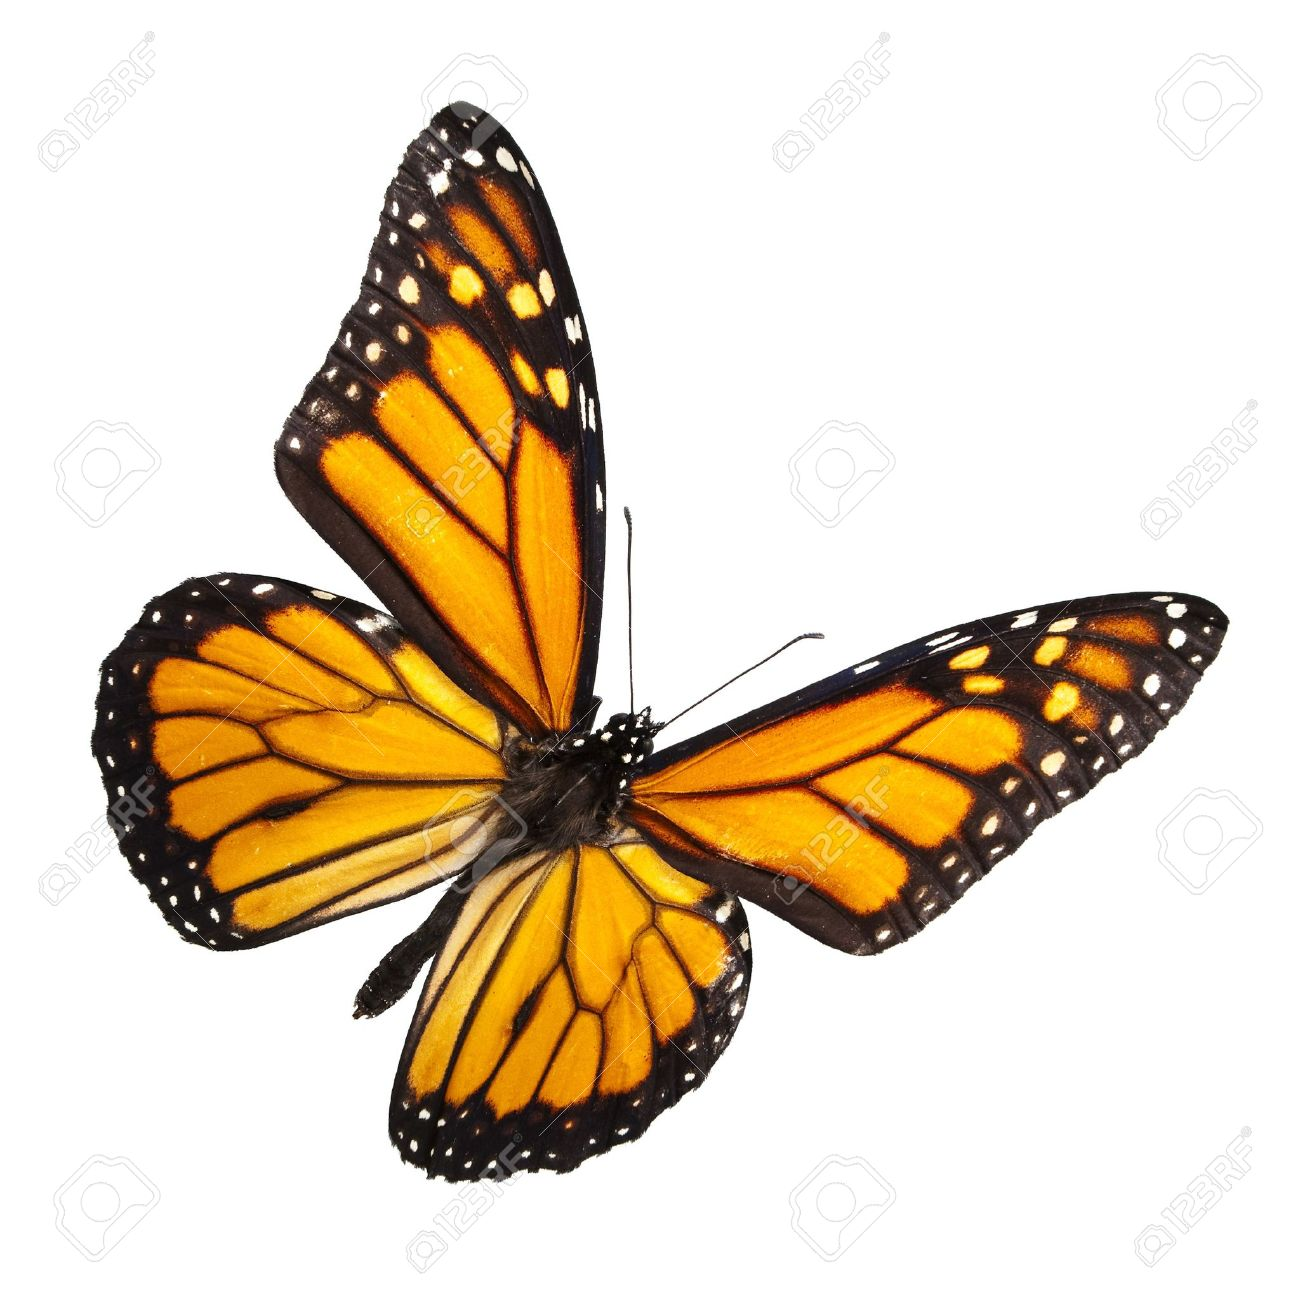 orange butterfly stock photos royalty free orange butterfly